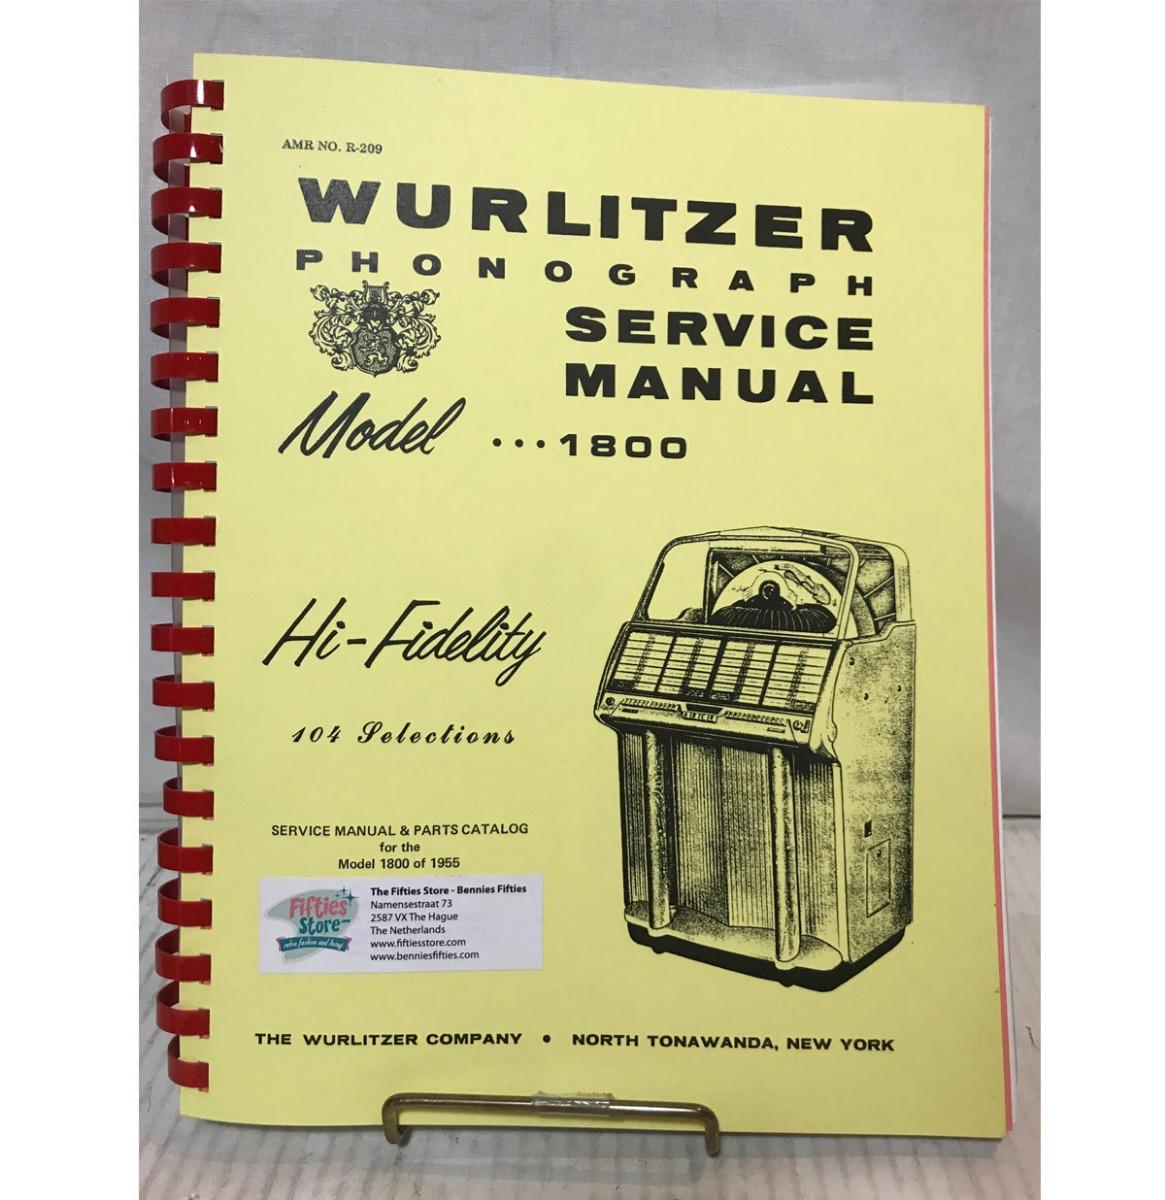 Wurlitzer 1800 Jukebox Service Manual